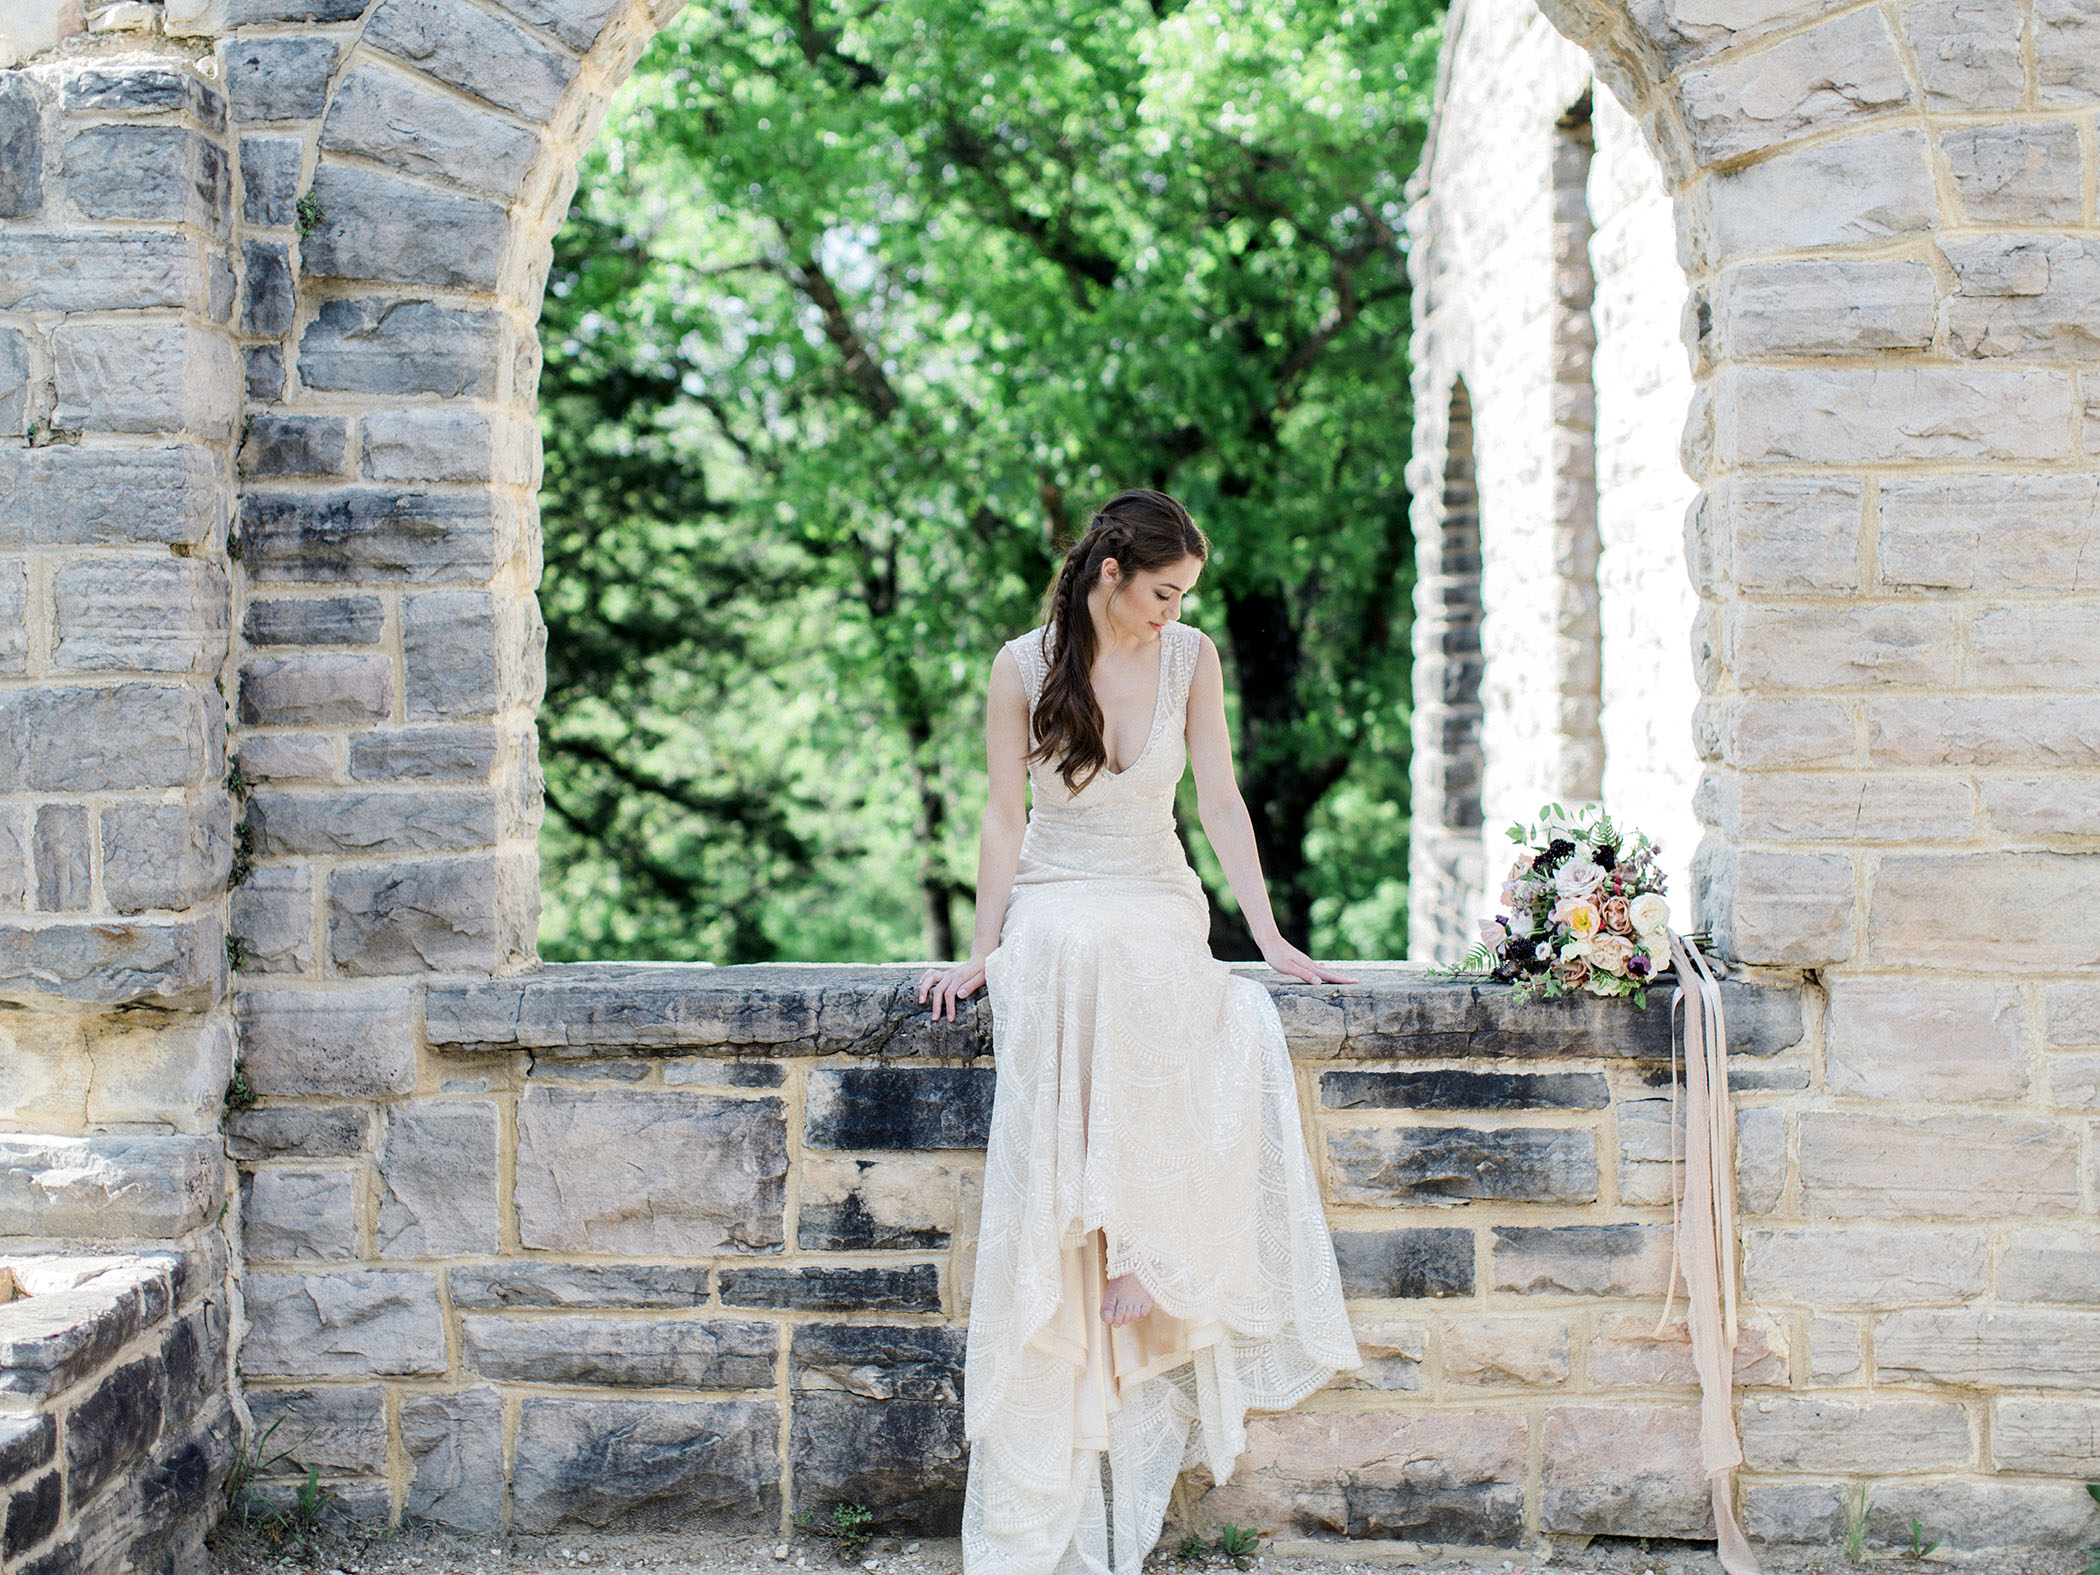 ha-ha-tonka-wedding-photos-eddy-k-lucia-36.jpg